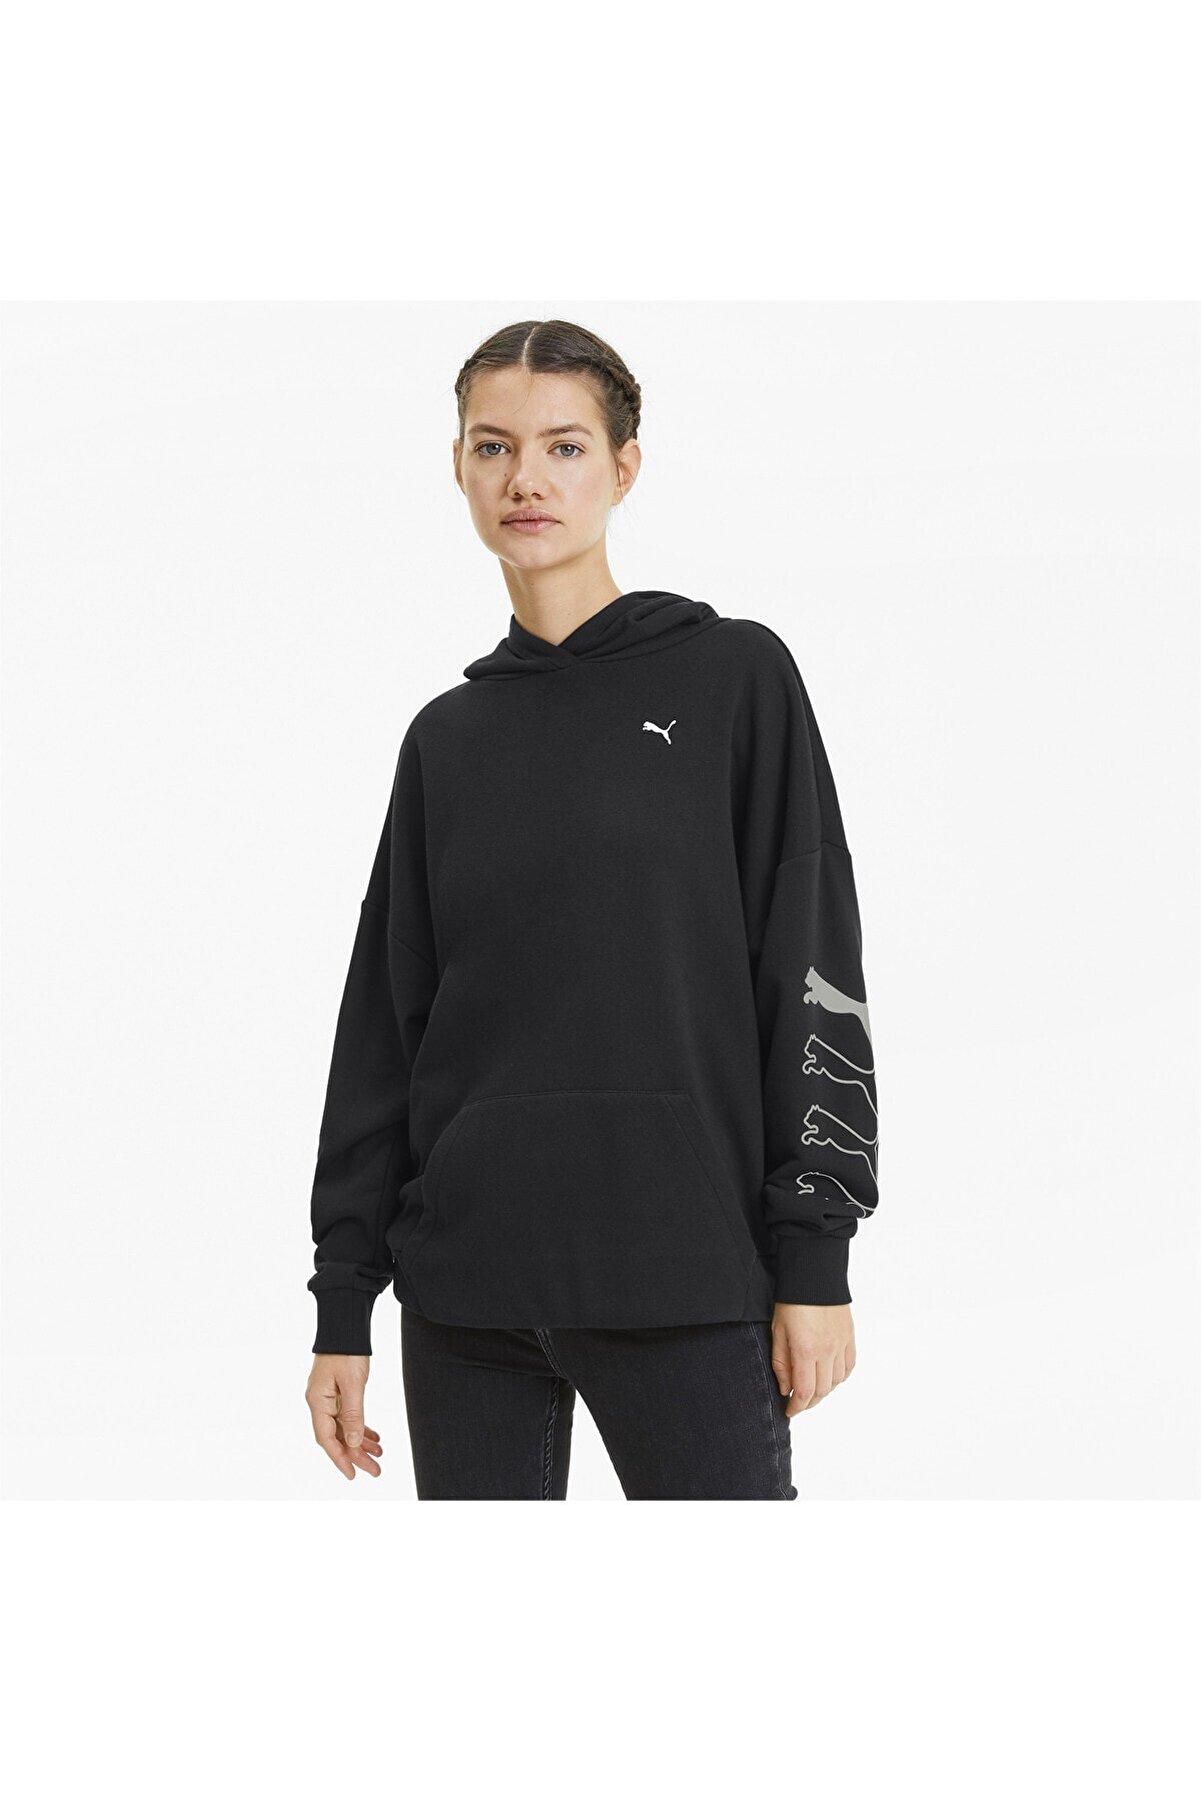 Puma Kadın Spor Sweatshirt - REBEL - 58130901